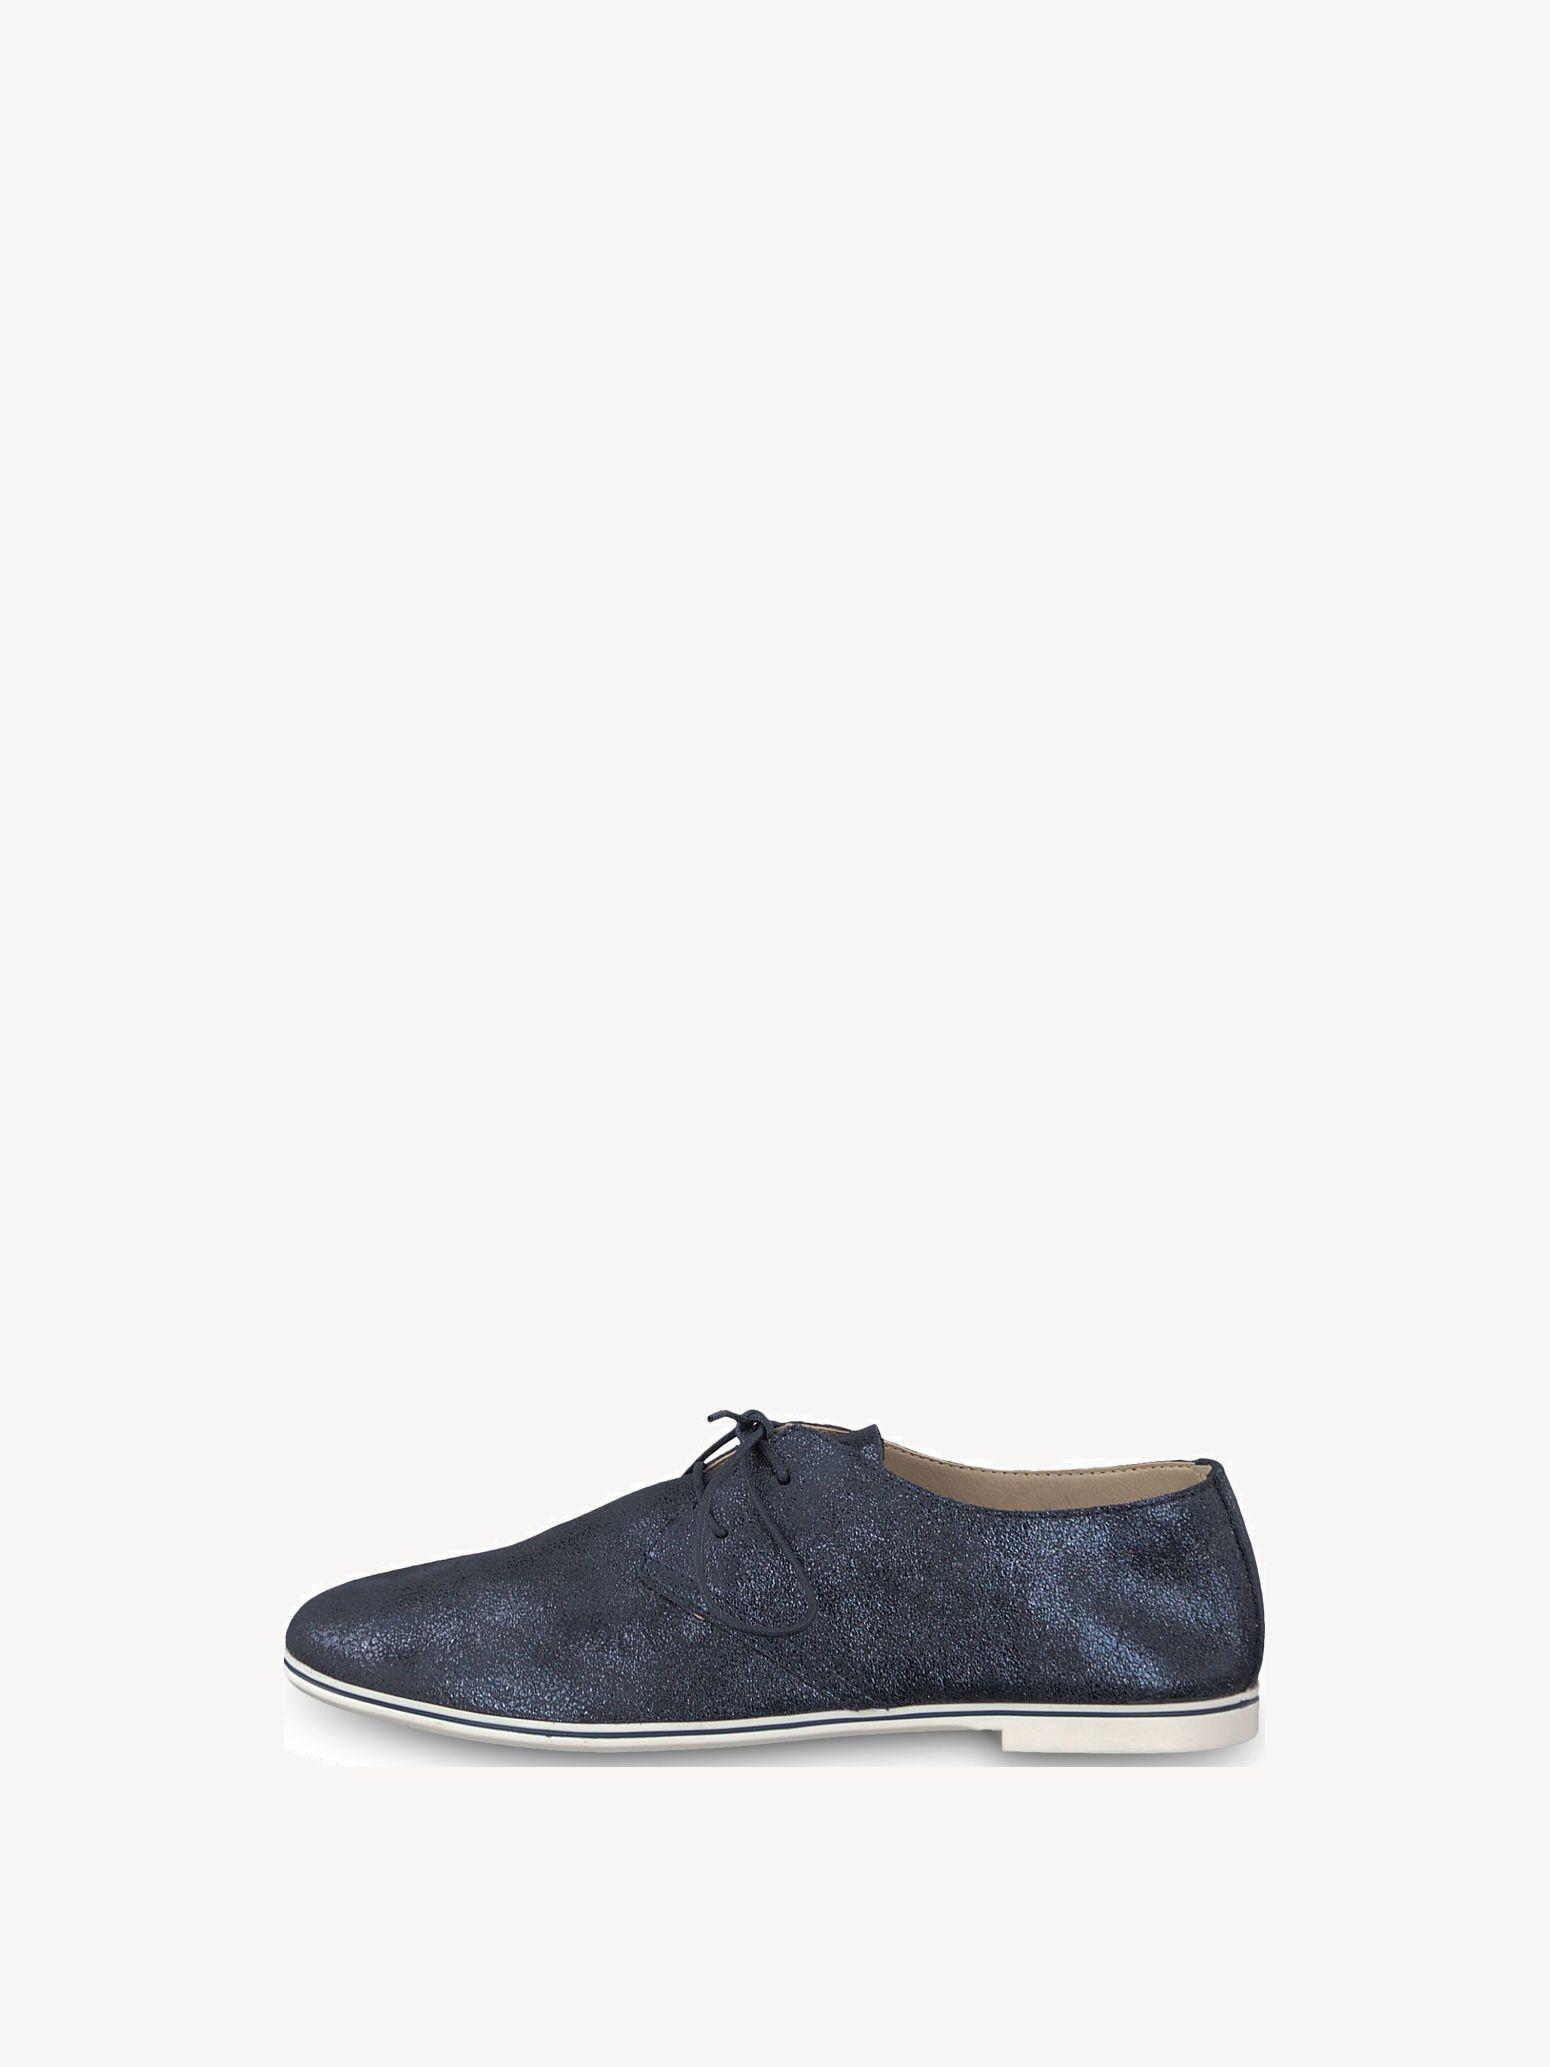 Tamaris Chaussures Basses Bleu   Brantano.be